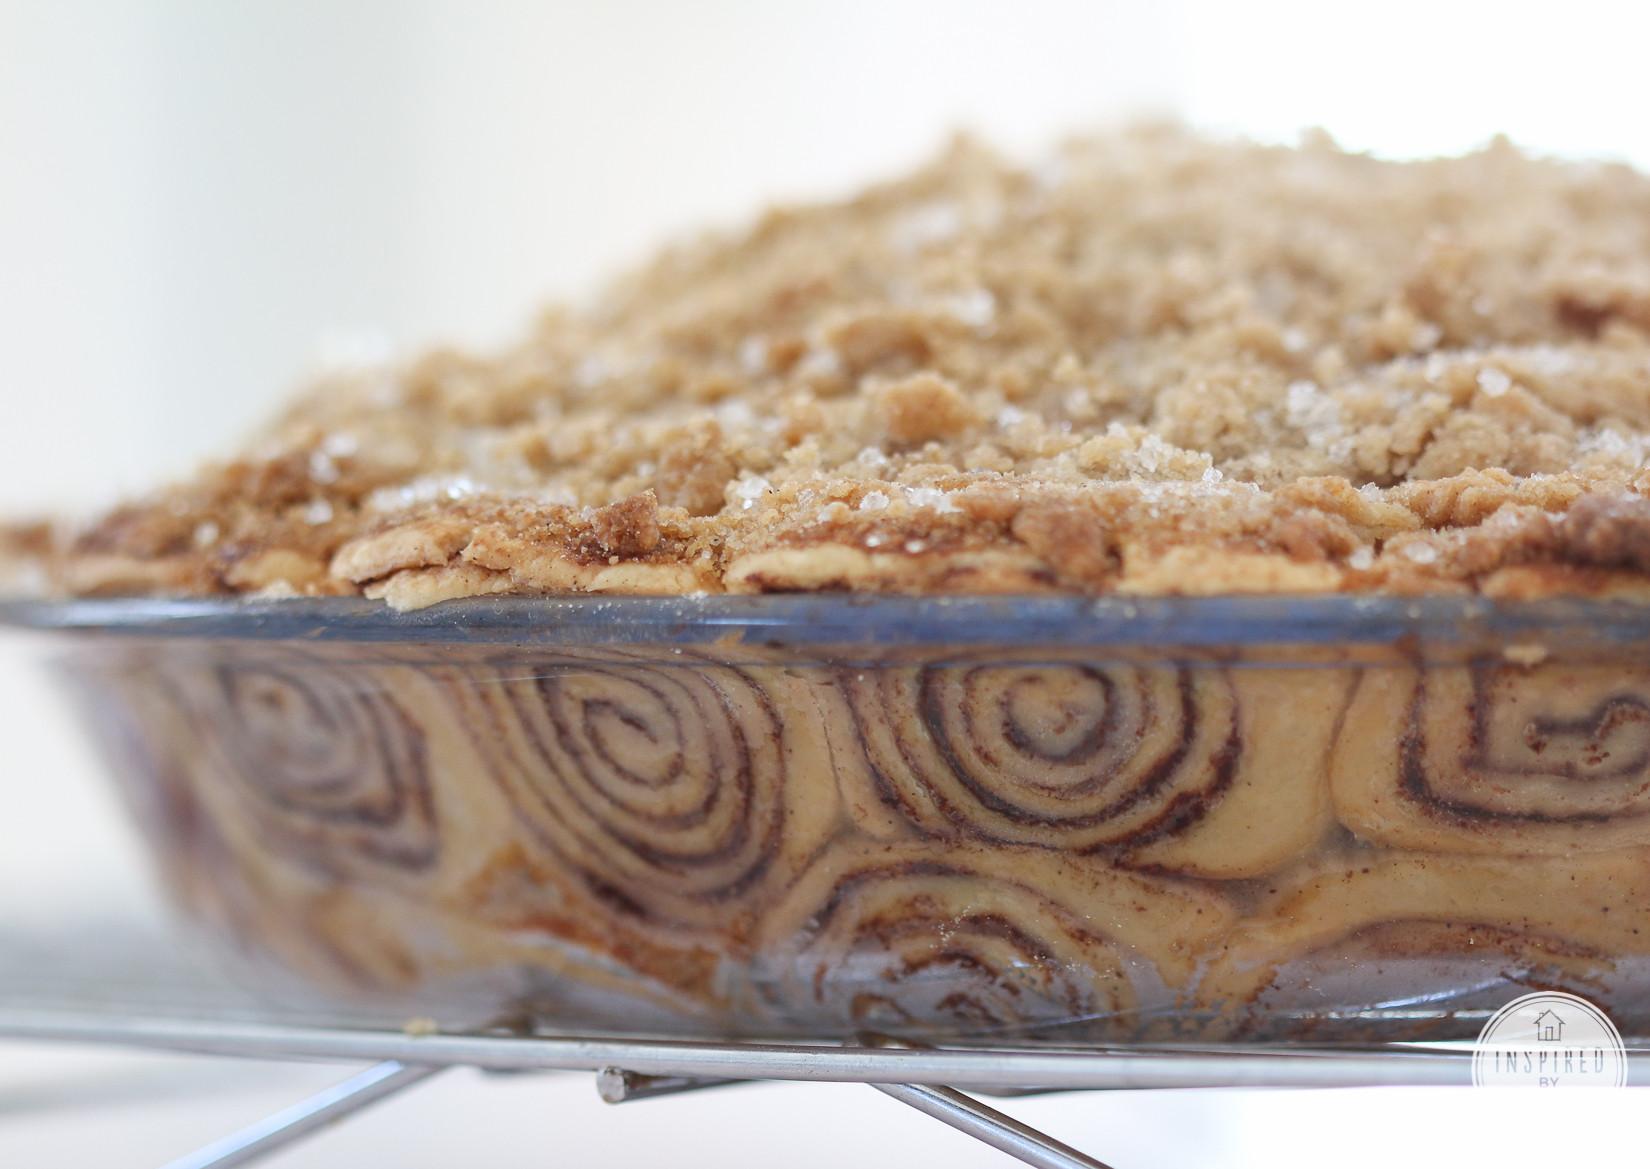 Apple Pie With Cinnamon Roll Crust  apple pie recipe with cinnamon roll crust